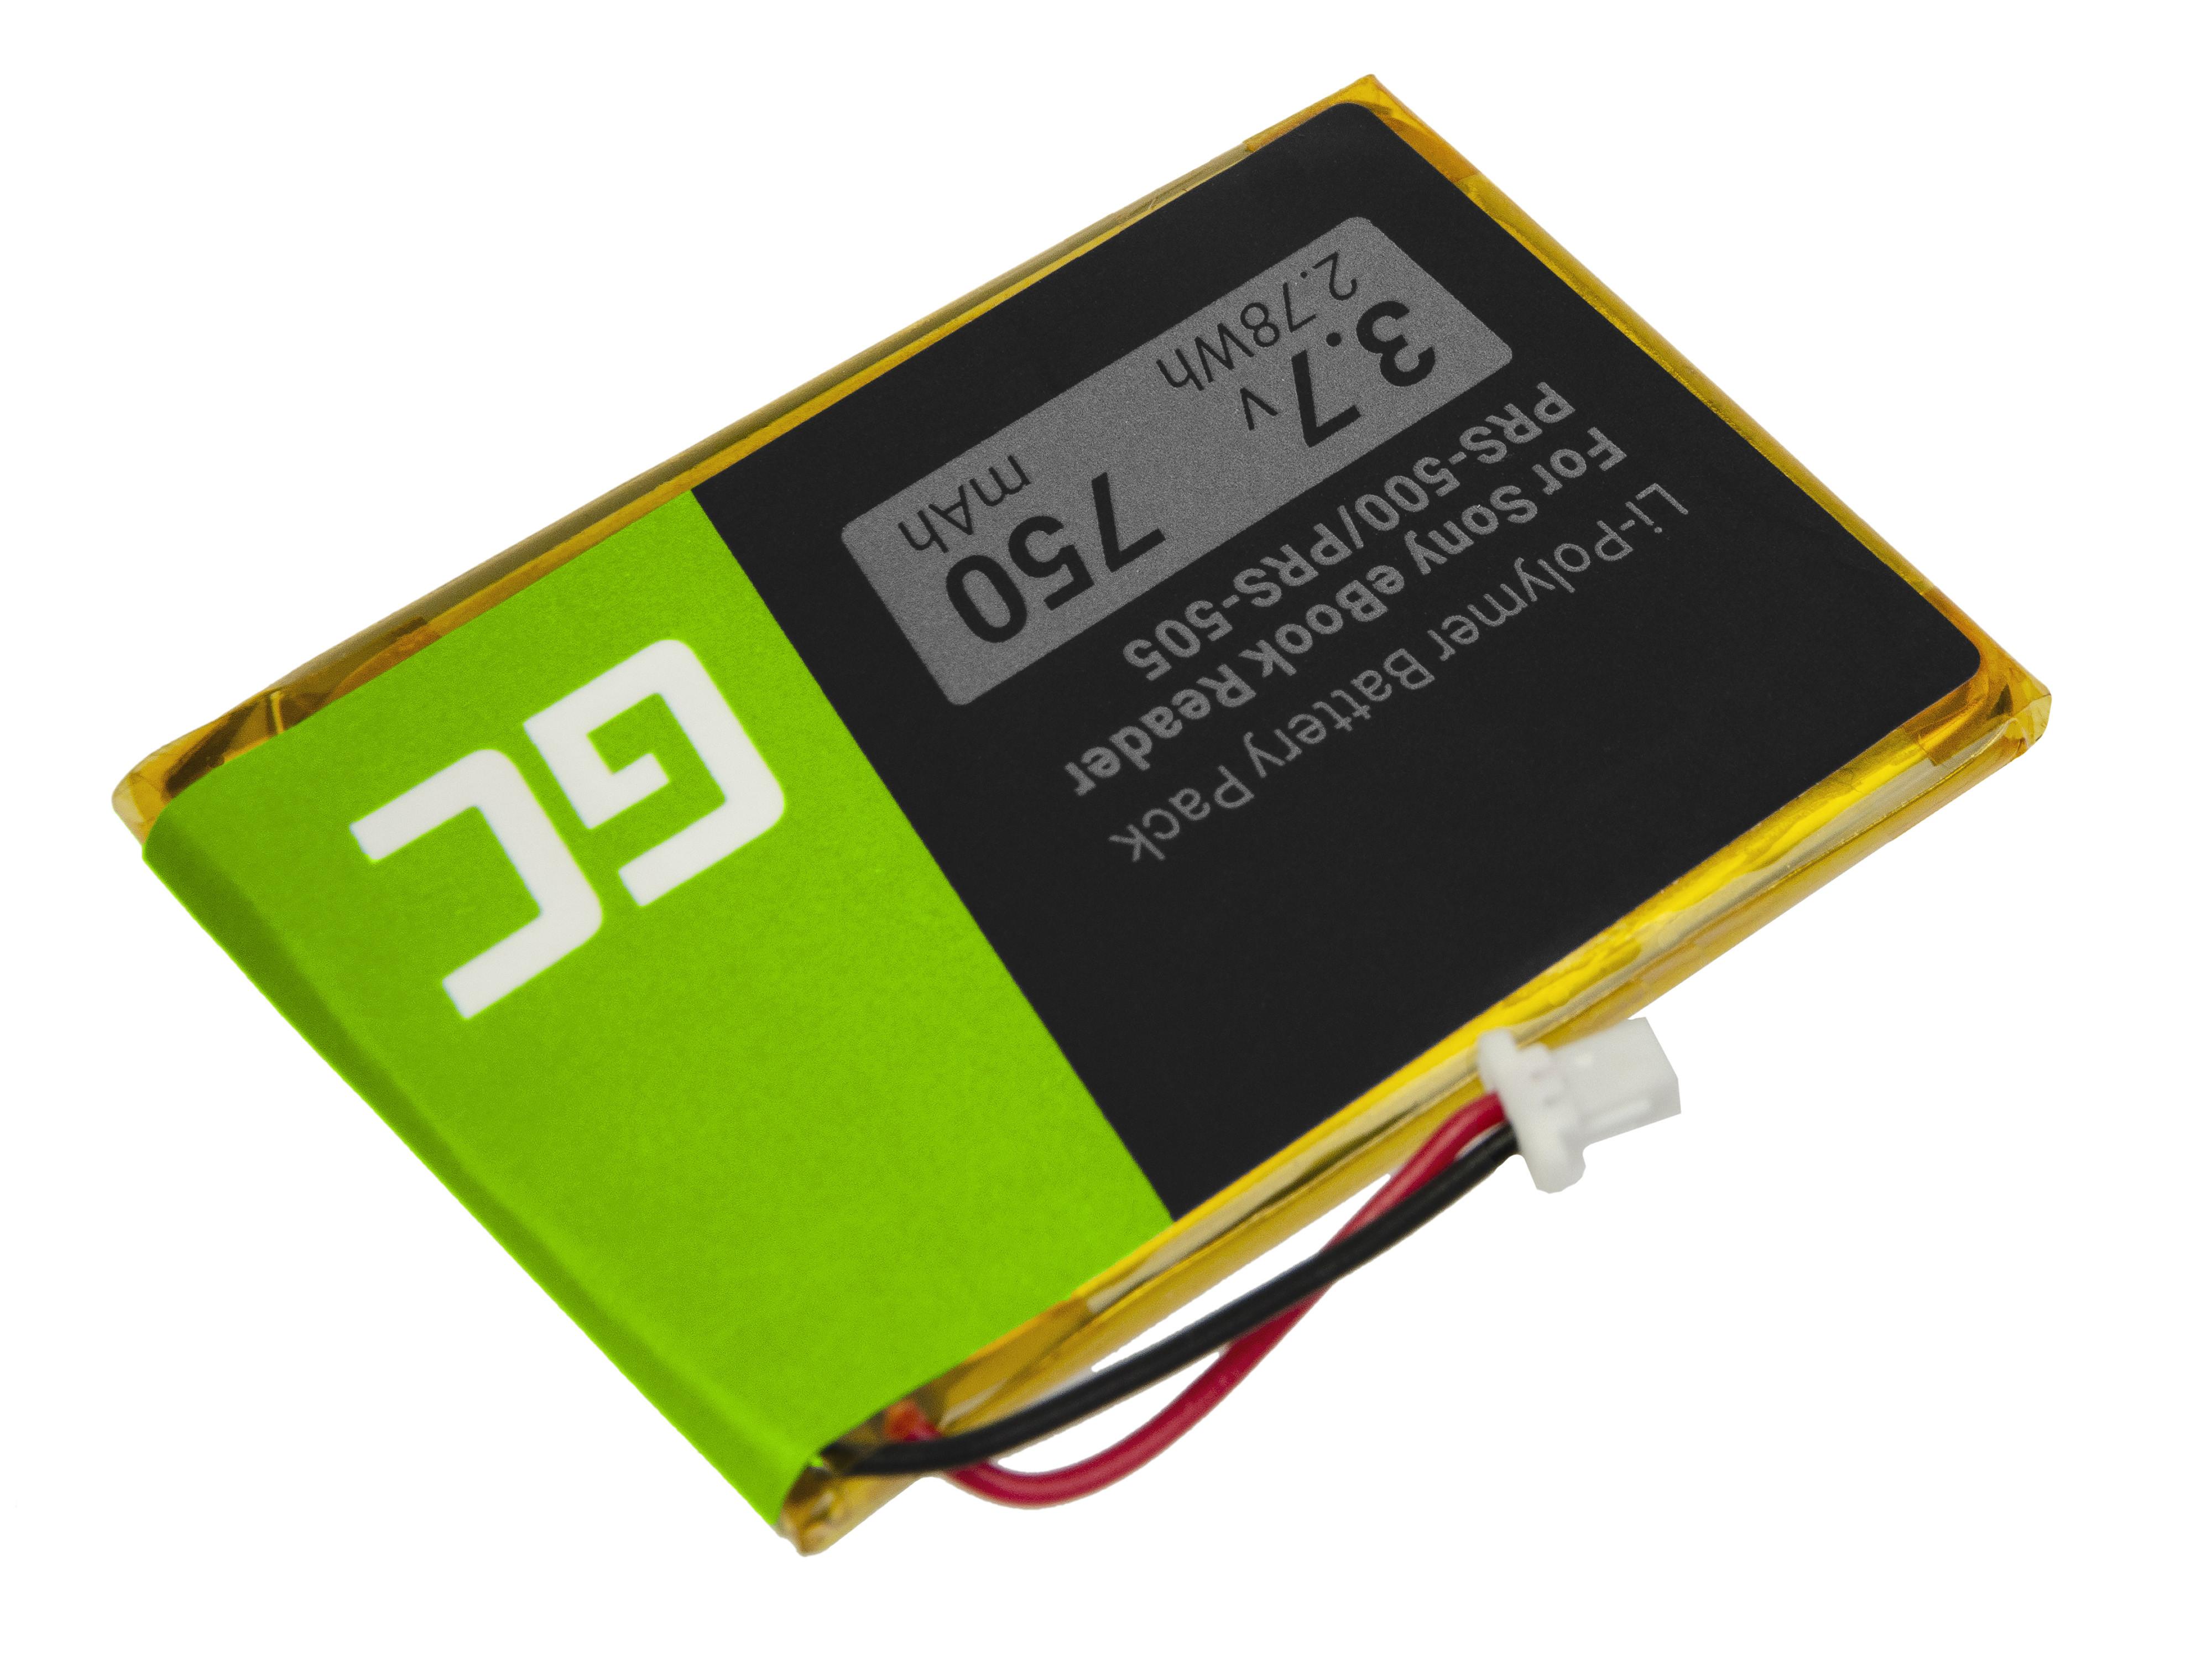 Baterie Green Cell 1-756-769-11 pro e-book Sony Portable Reader System PRS-500 + PRS-505 750mAh Li-ion - neoriginální